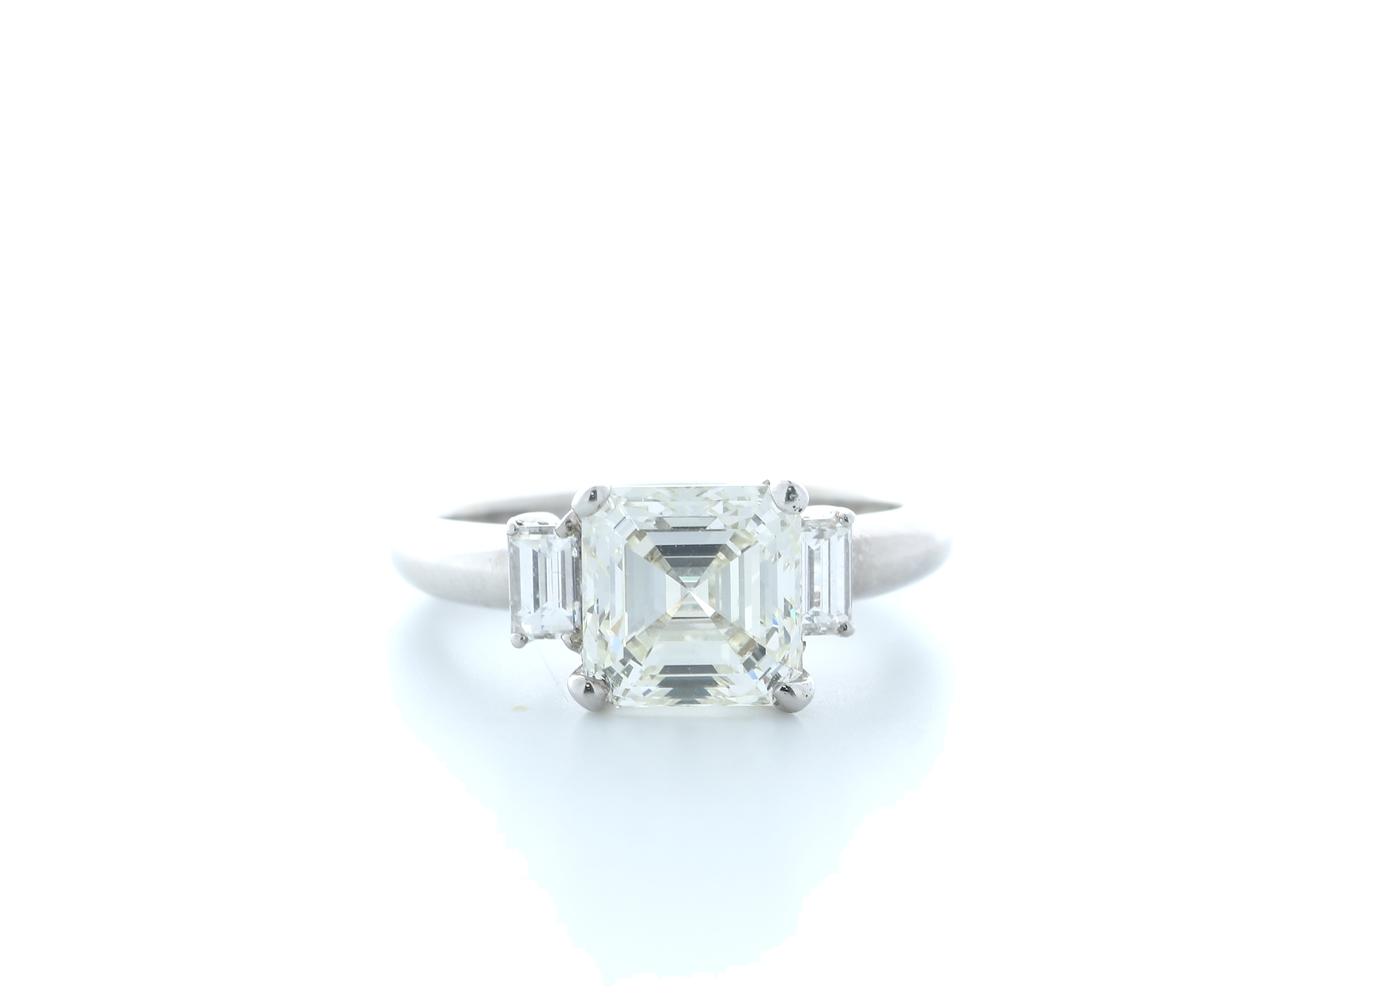 18ct White Gold Three Stone Claw Set Diamond Ring 3.11(2.70) Carats